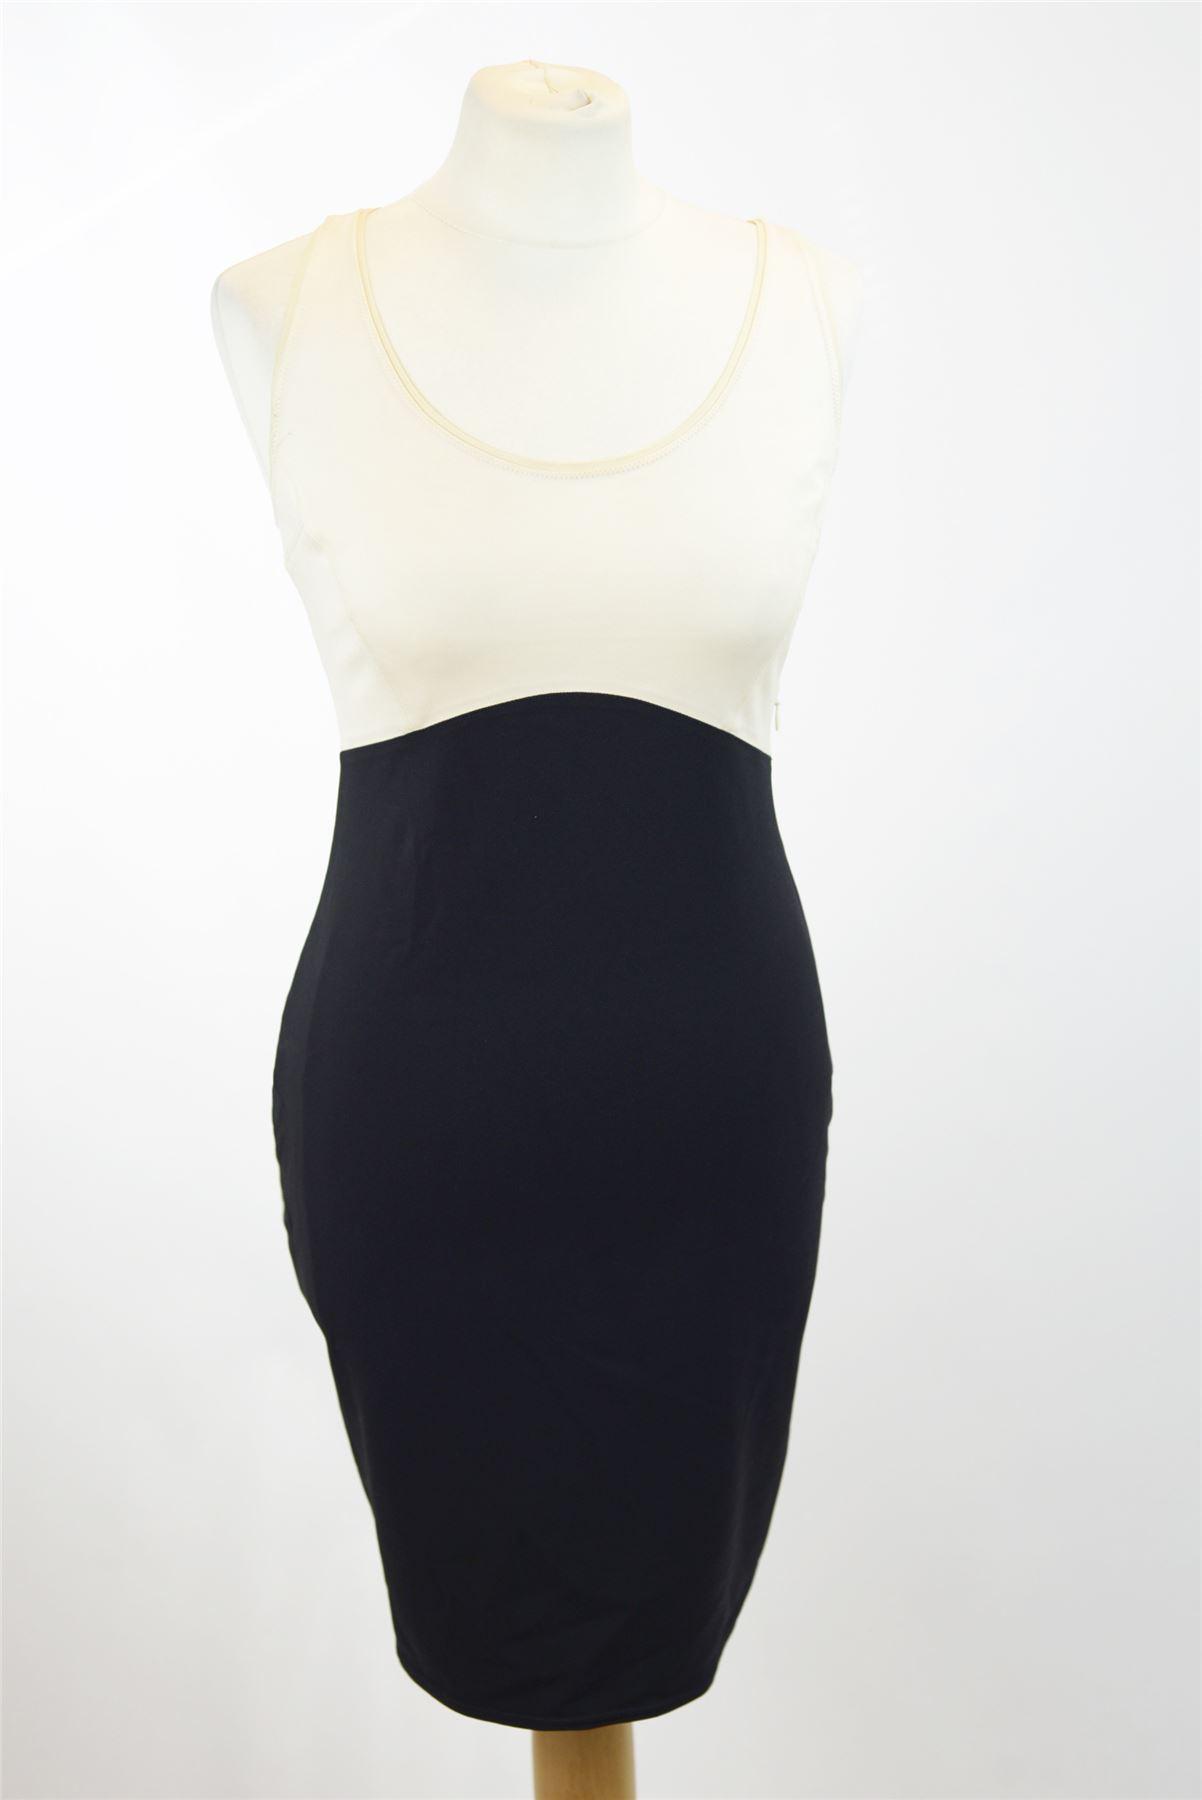 HALSTON HERITAGE schwarz And Beige Dress, US 6